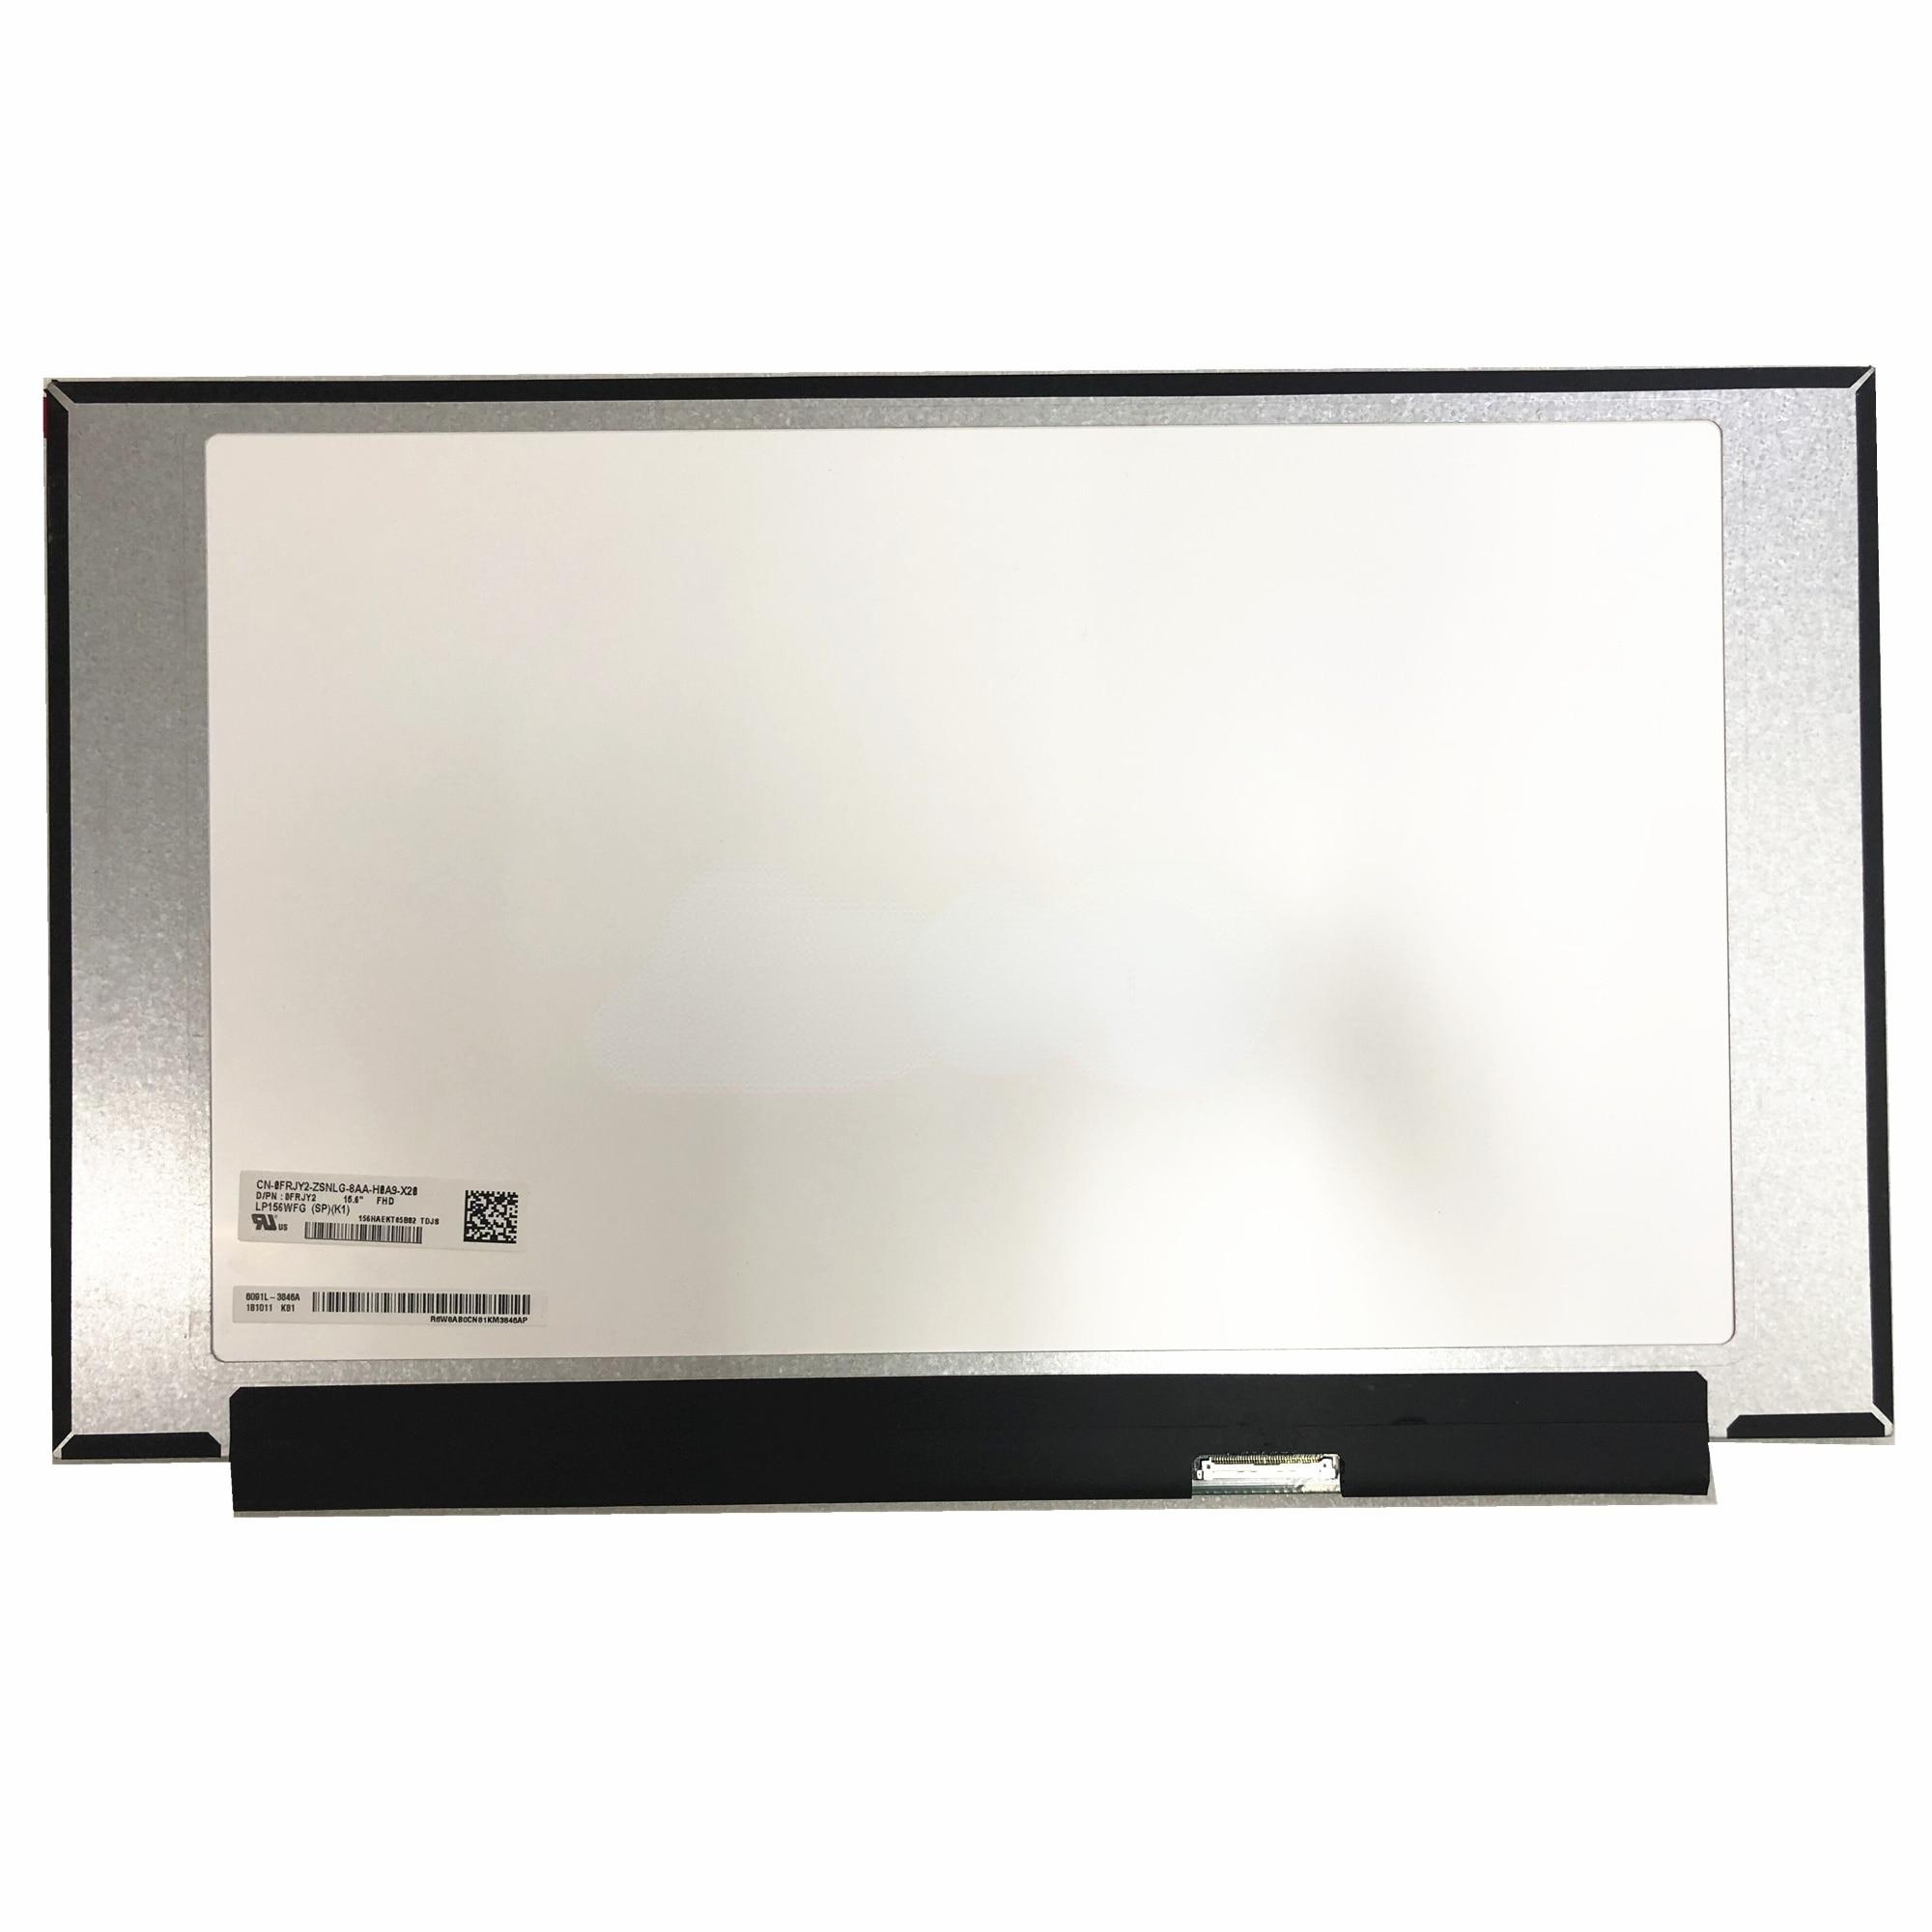 LP156WFG-SPK1 LP156WFG SPK1 صالح LP156WFG-SPB3 LP156WFG-SPF3 LP156WFG-SPF2 72% NTSC 144Hz FHD IPS LCD شاشة عرض